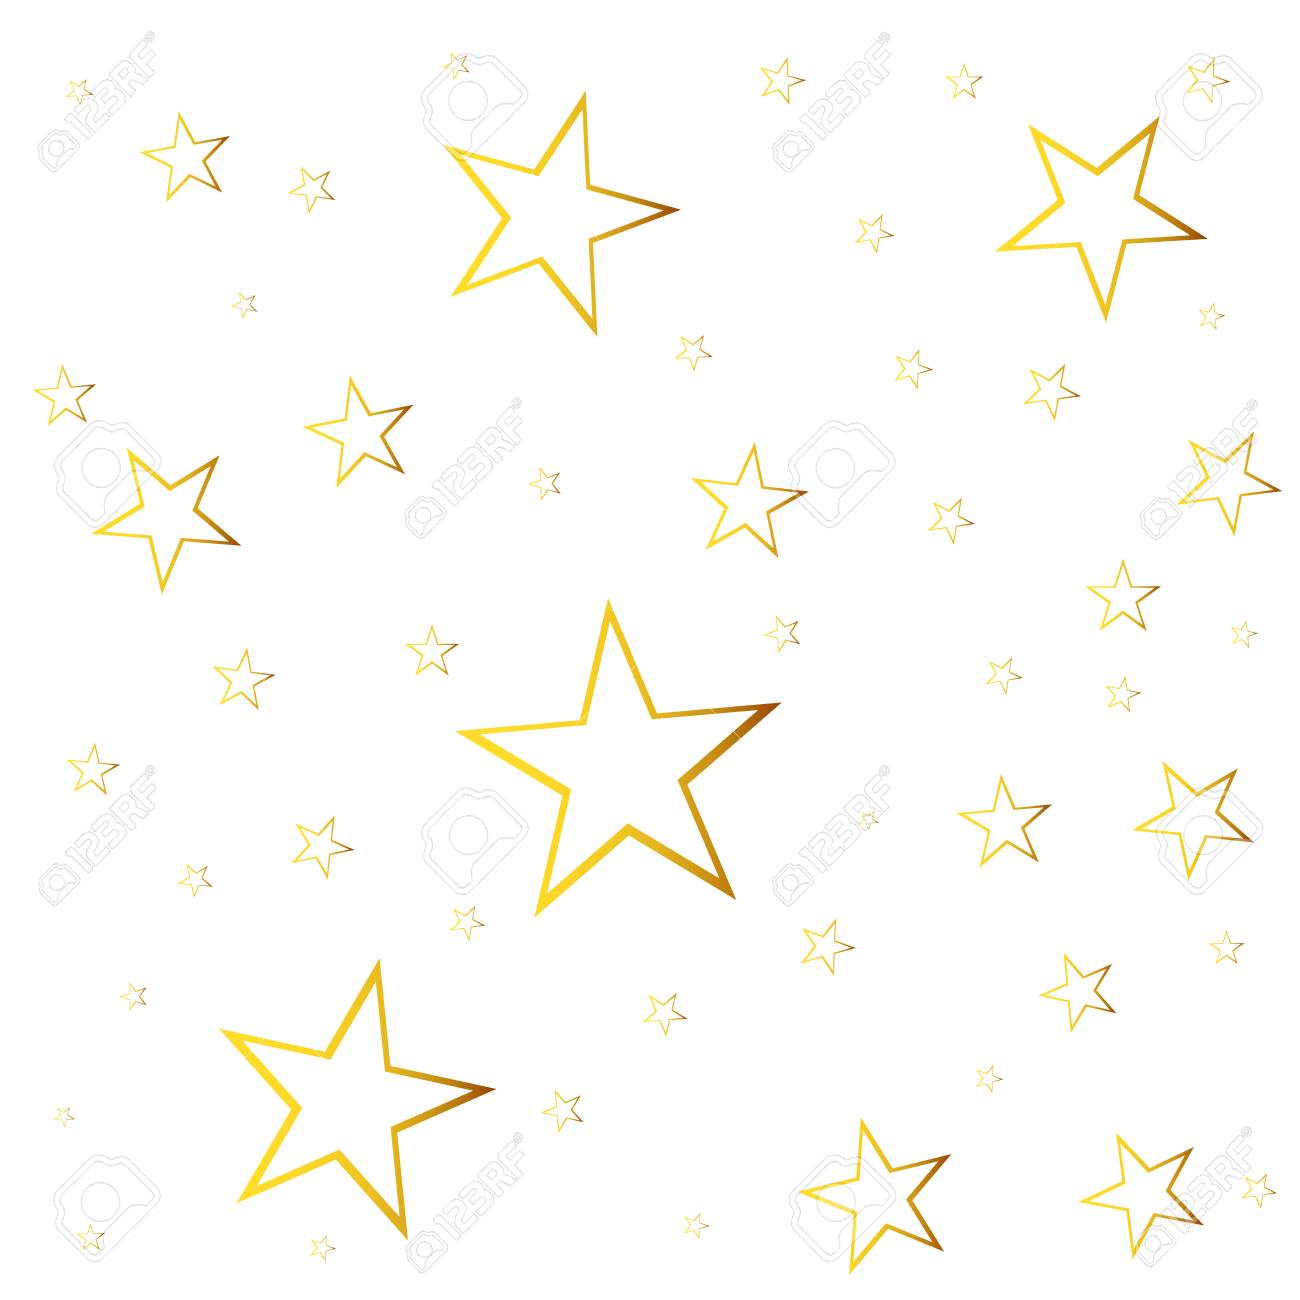 Abstrakt Sternschnuppe Vektor Illustration Mit Goldenen